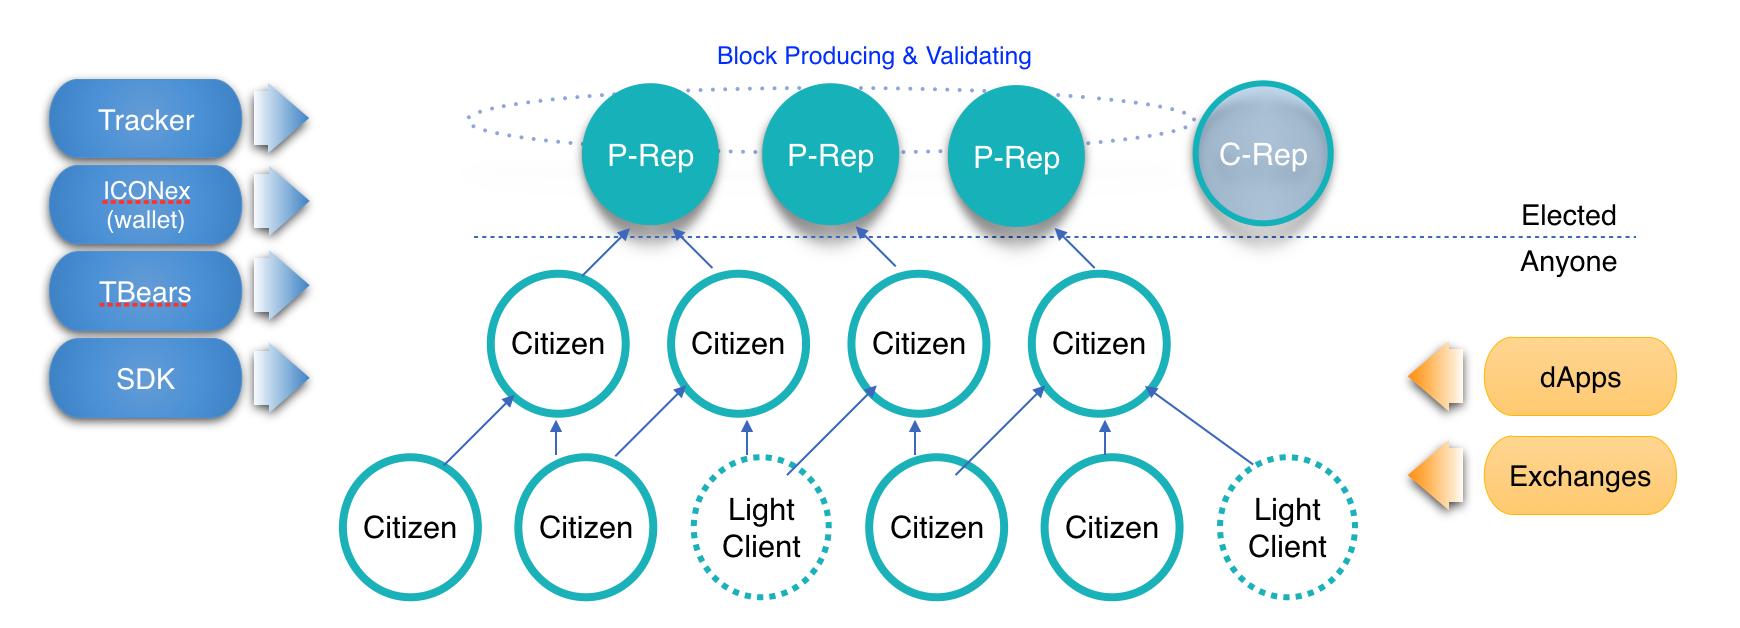 types of nodes